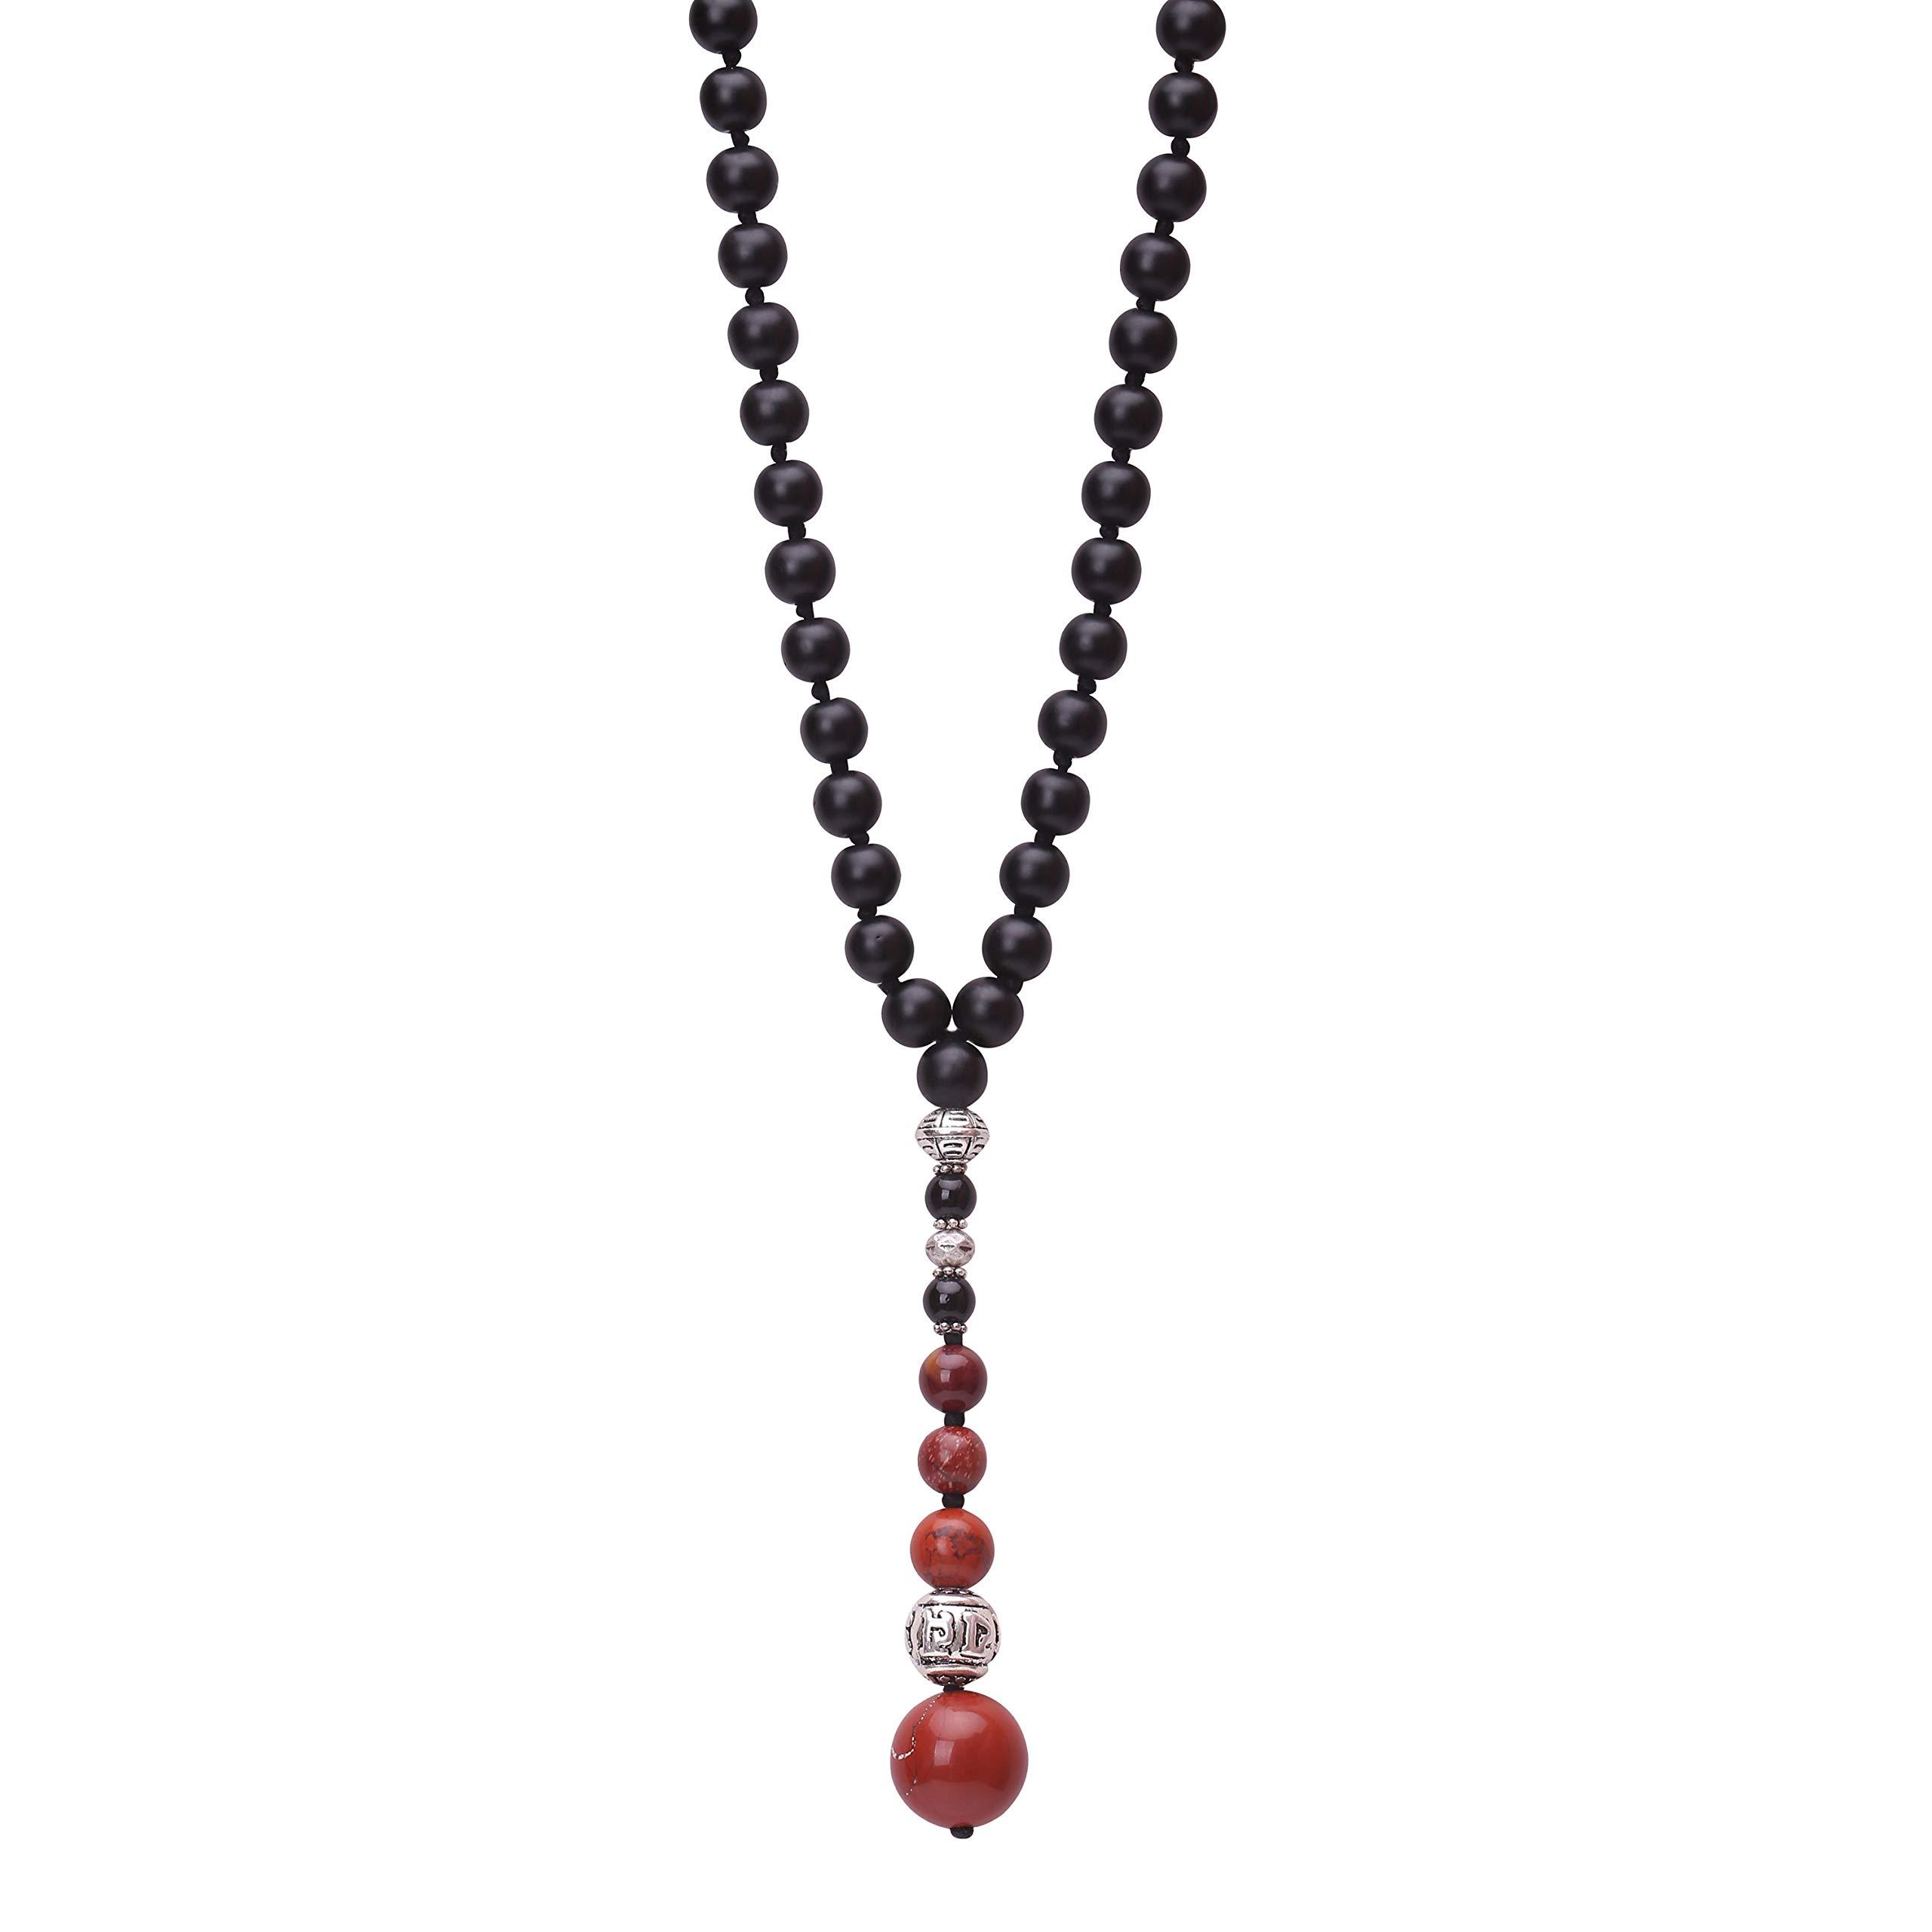 Agate Mala Beads Pendant Necklace Gemstone Beaded Prayer Handmade Y-shaped Jewelry for Women